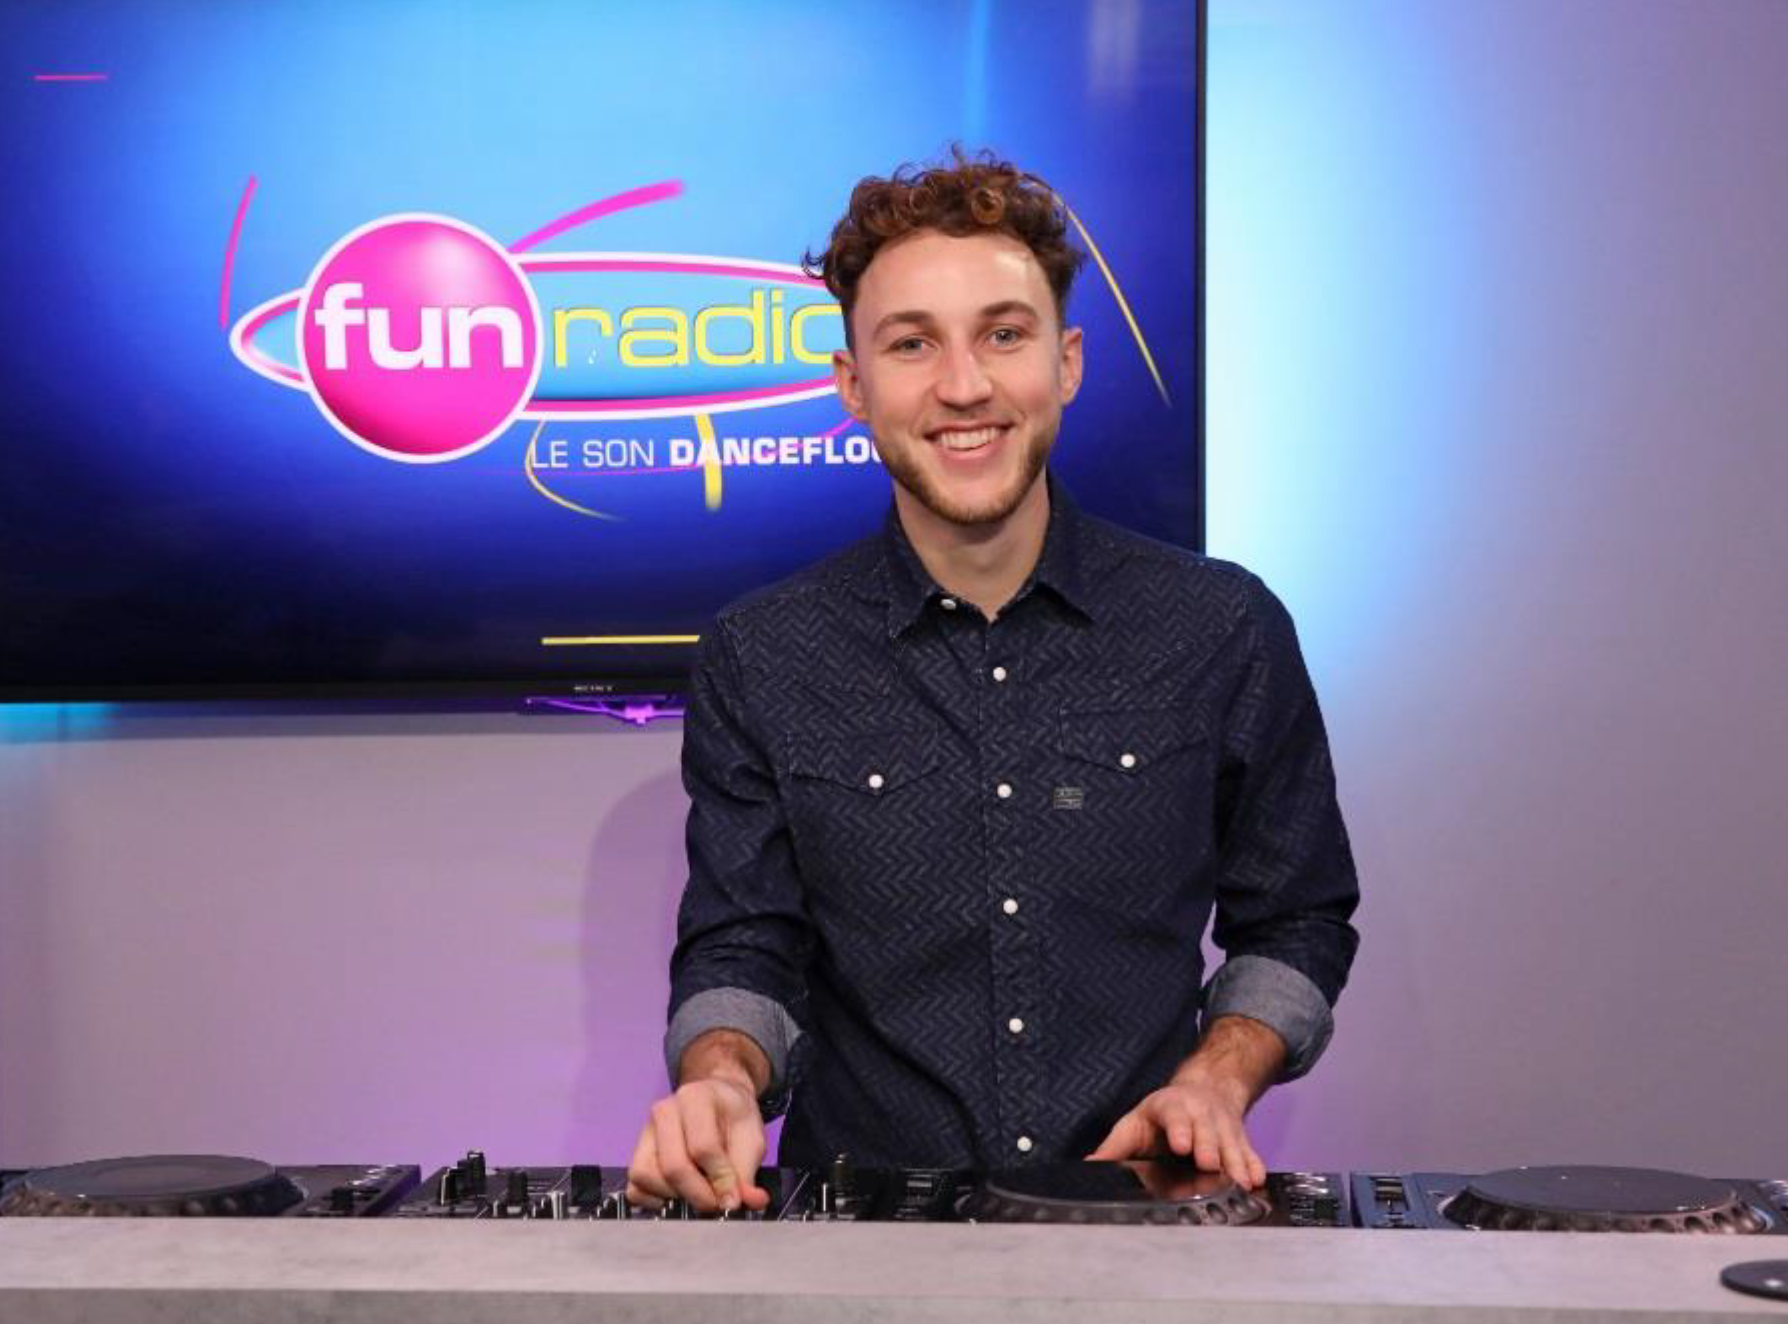 Le DJ Alex Wat rejoint l'équipe de Fun Radio © Frédéric Bukajlo / SIPA Press